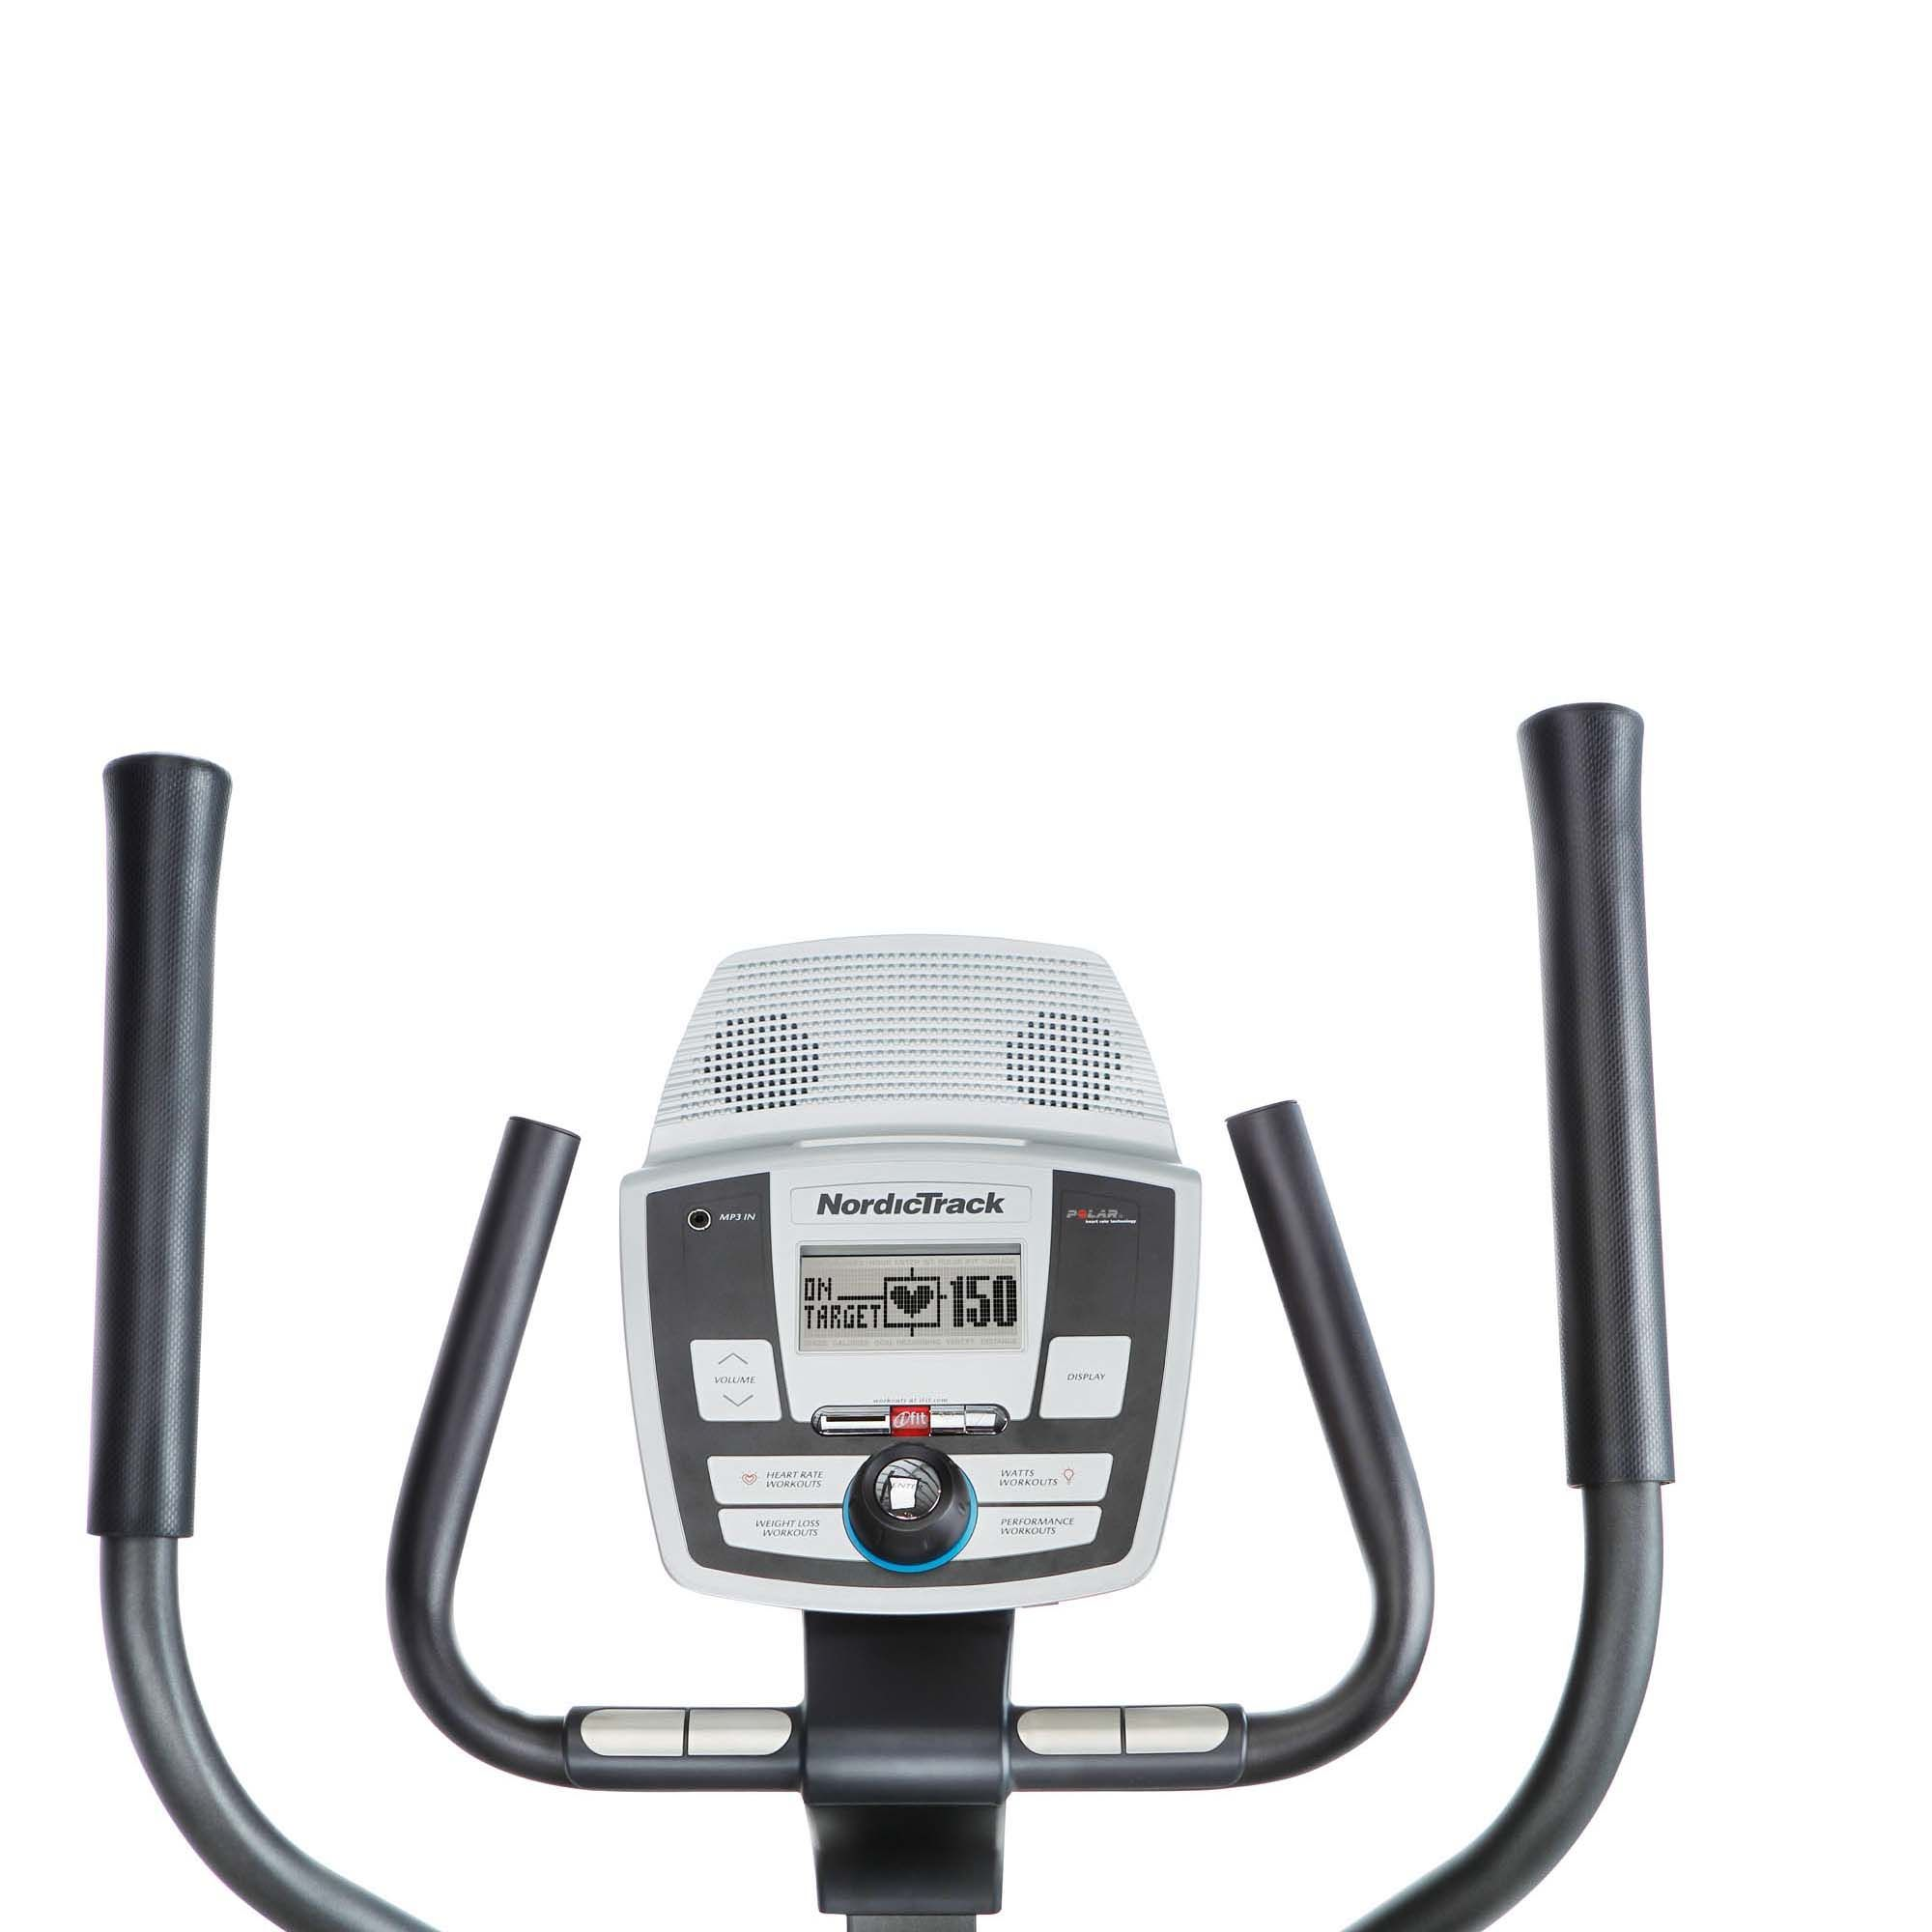 NordicTrack E4.0 Elliptical Cross Trainer